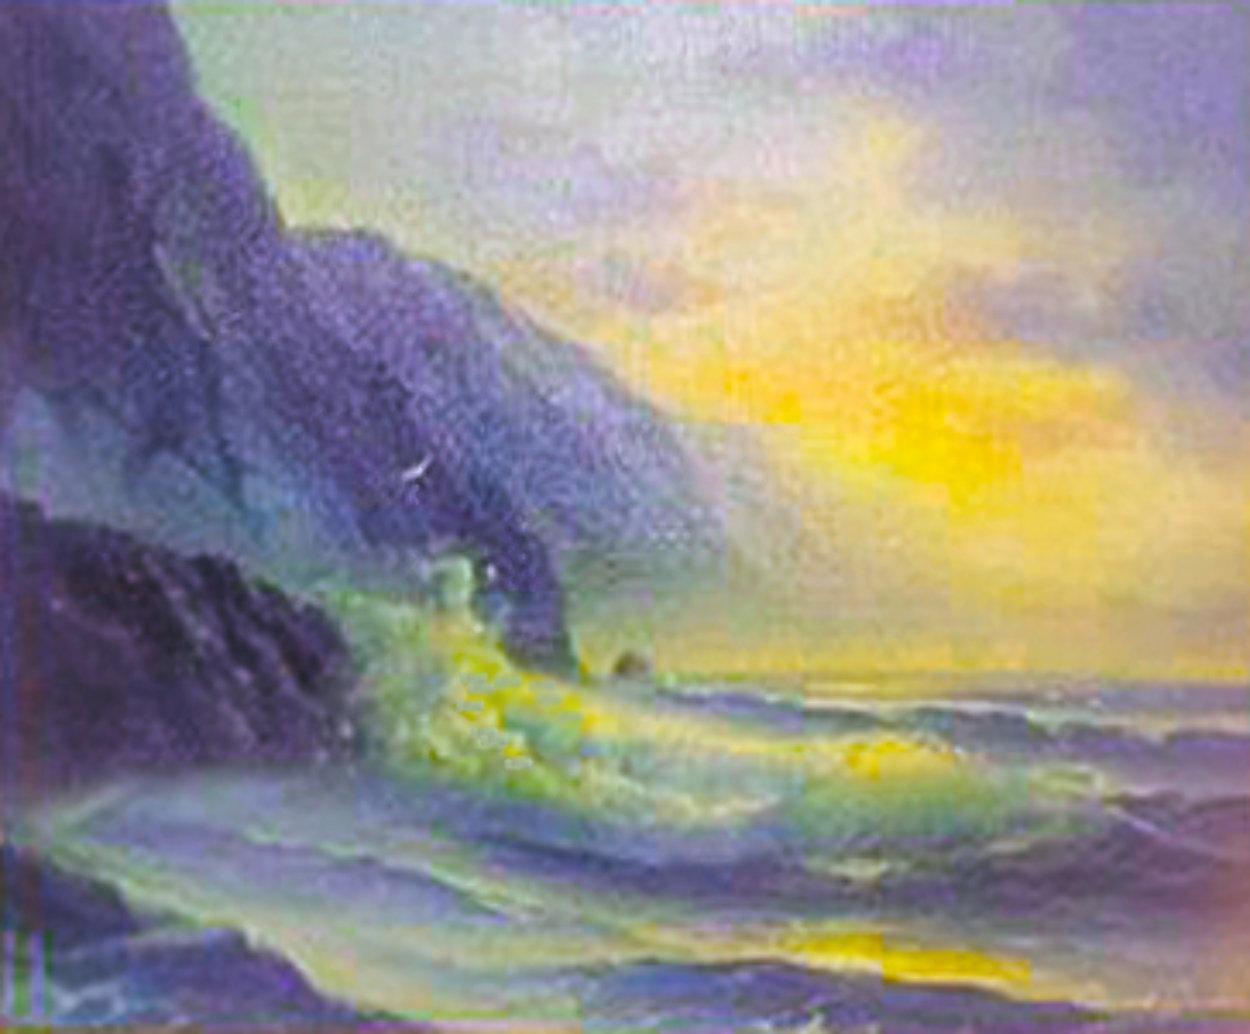 Seascape 28x34 Original Painting by Edward Barton